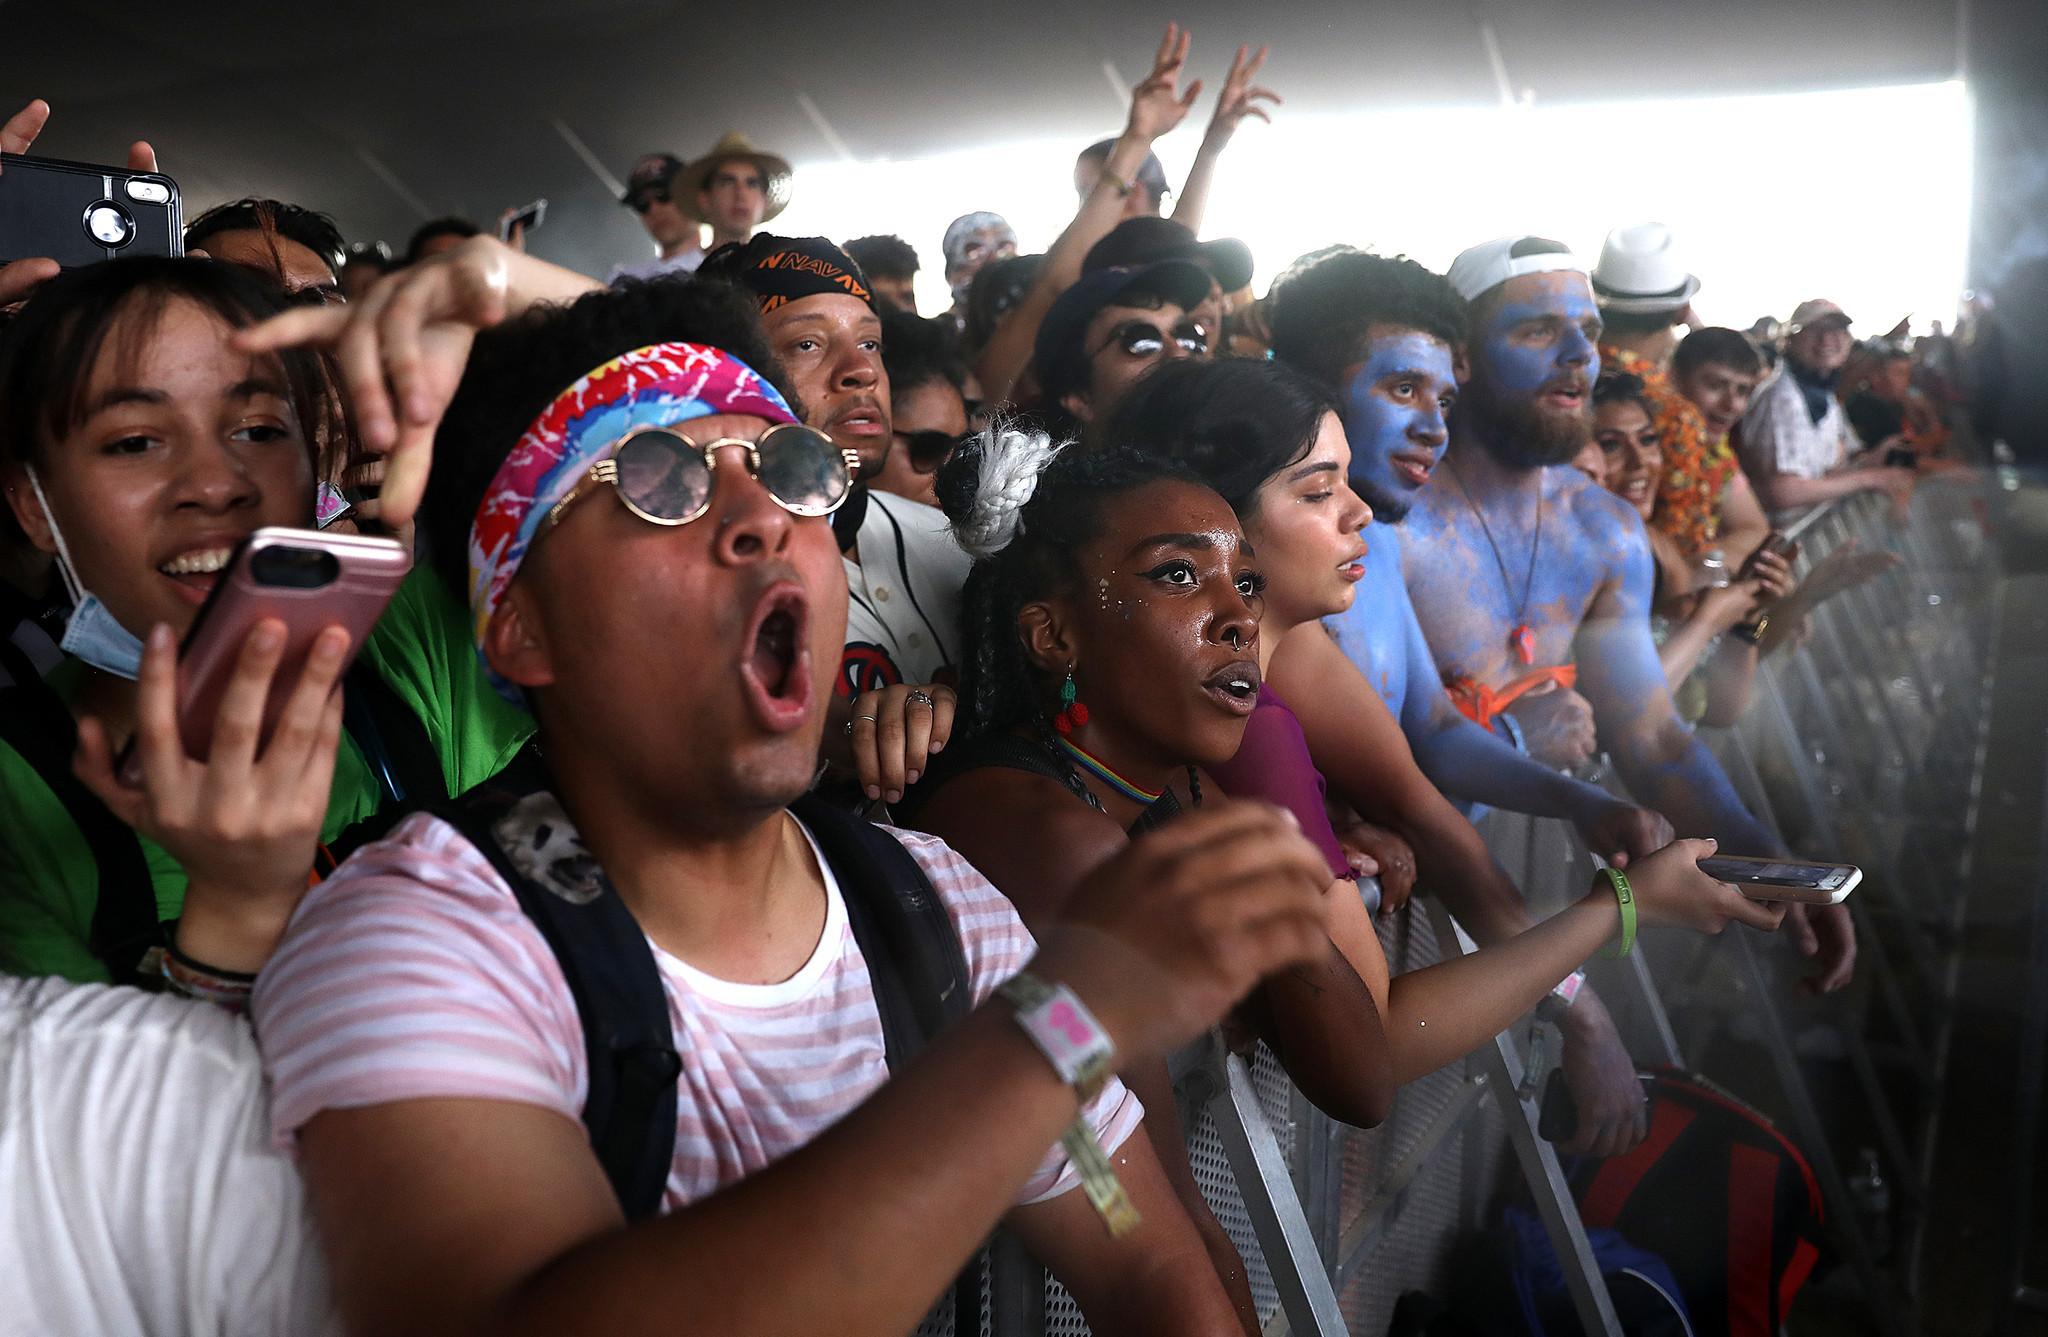 INDIO-CA-APRIL 21, 2018: Fans watch Brockhampton perform at Coachella Weekend 2 on Saturday, April 2